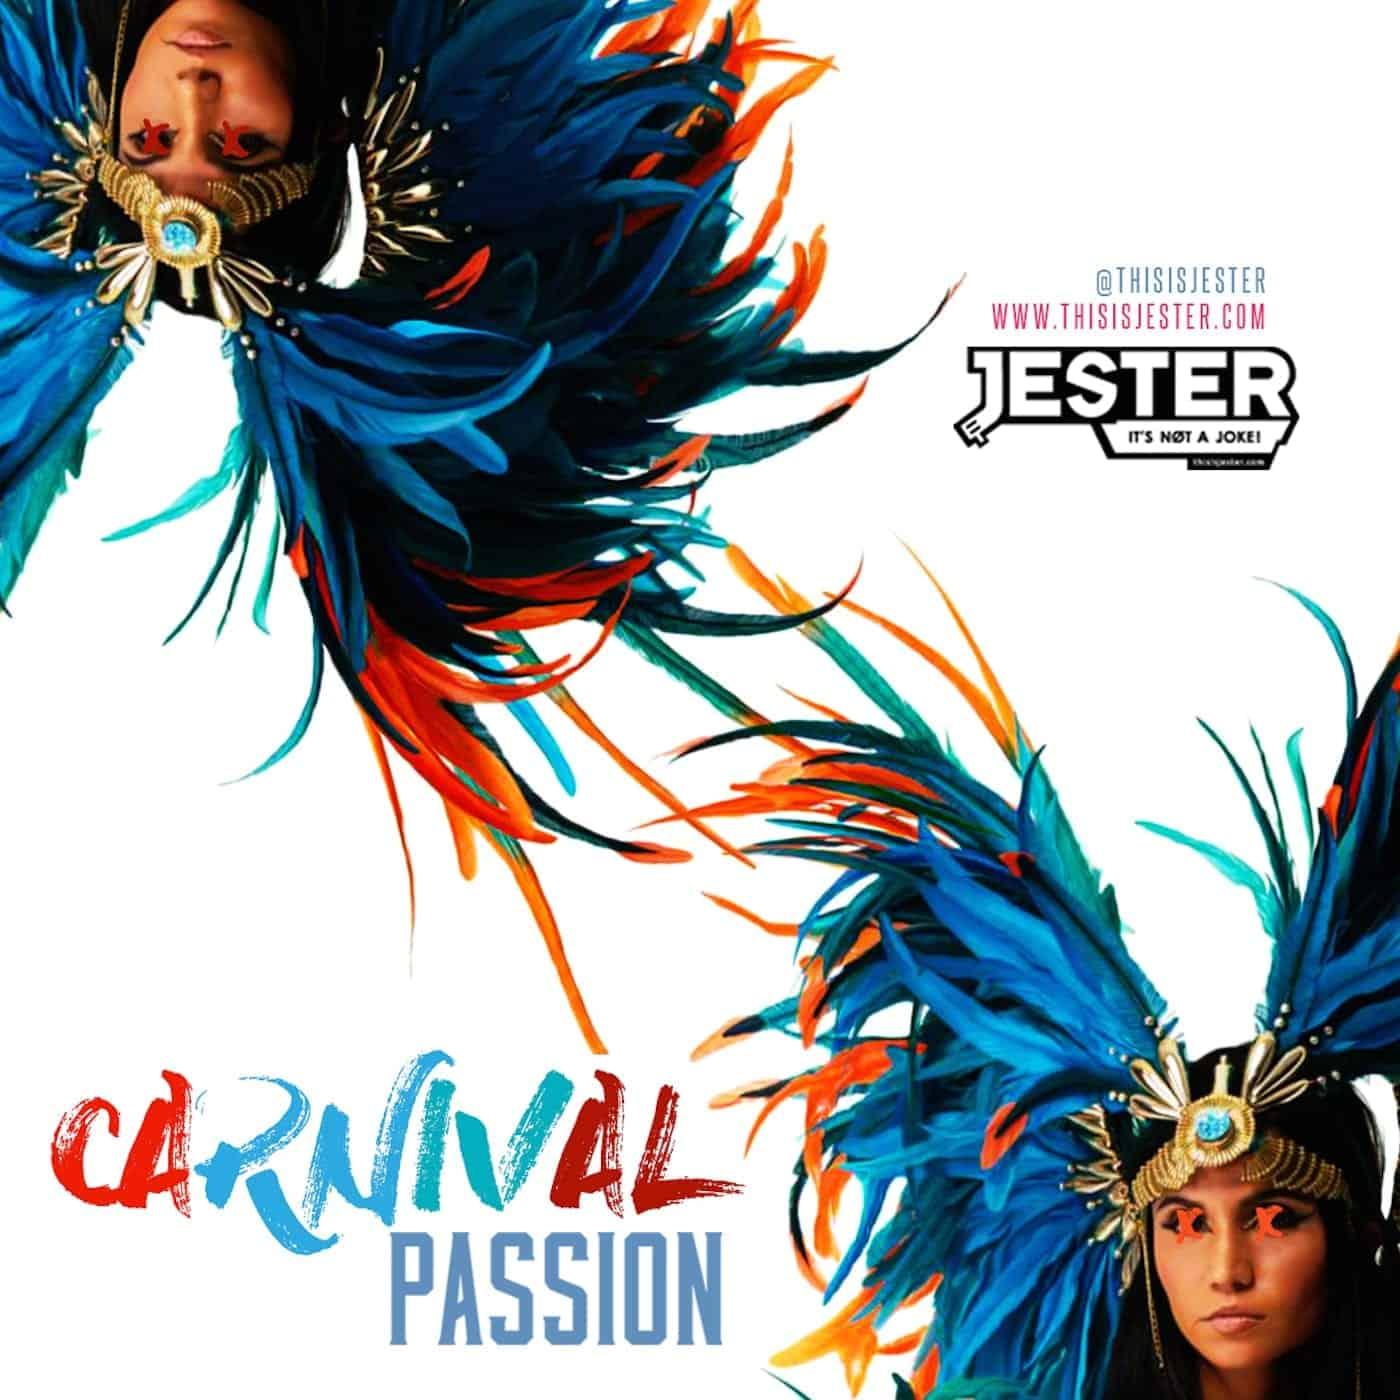 Jester presents Carnival Passion 2016